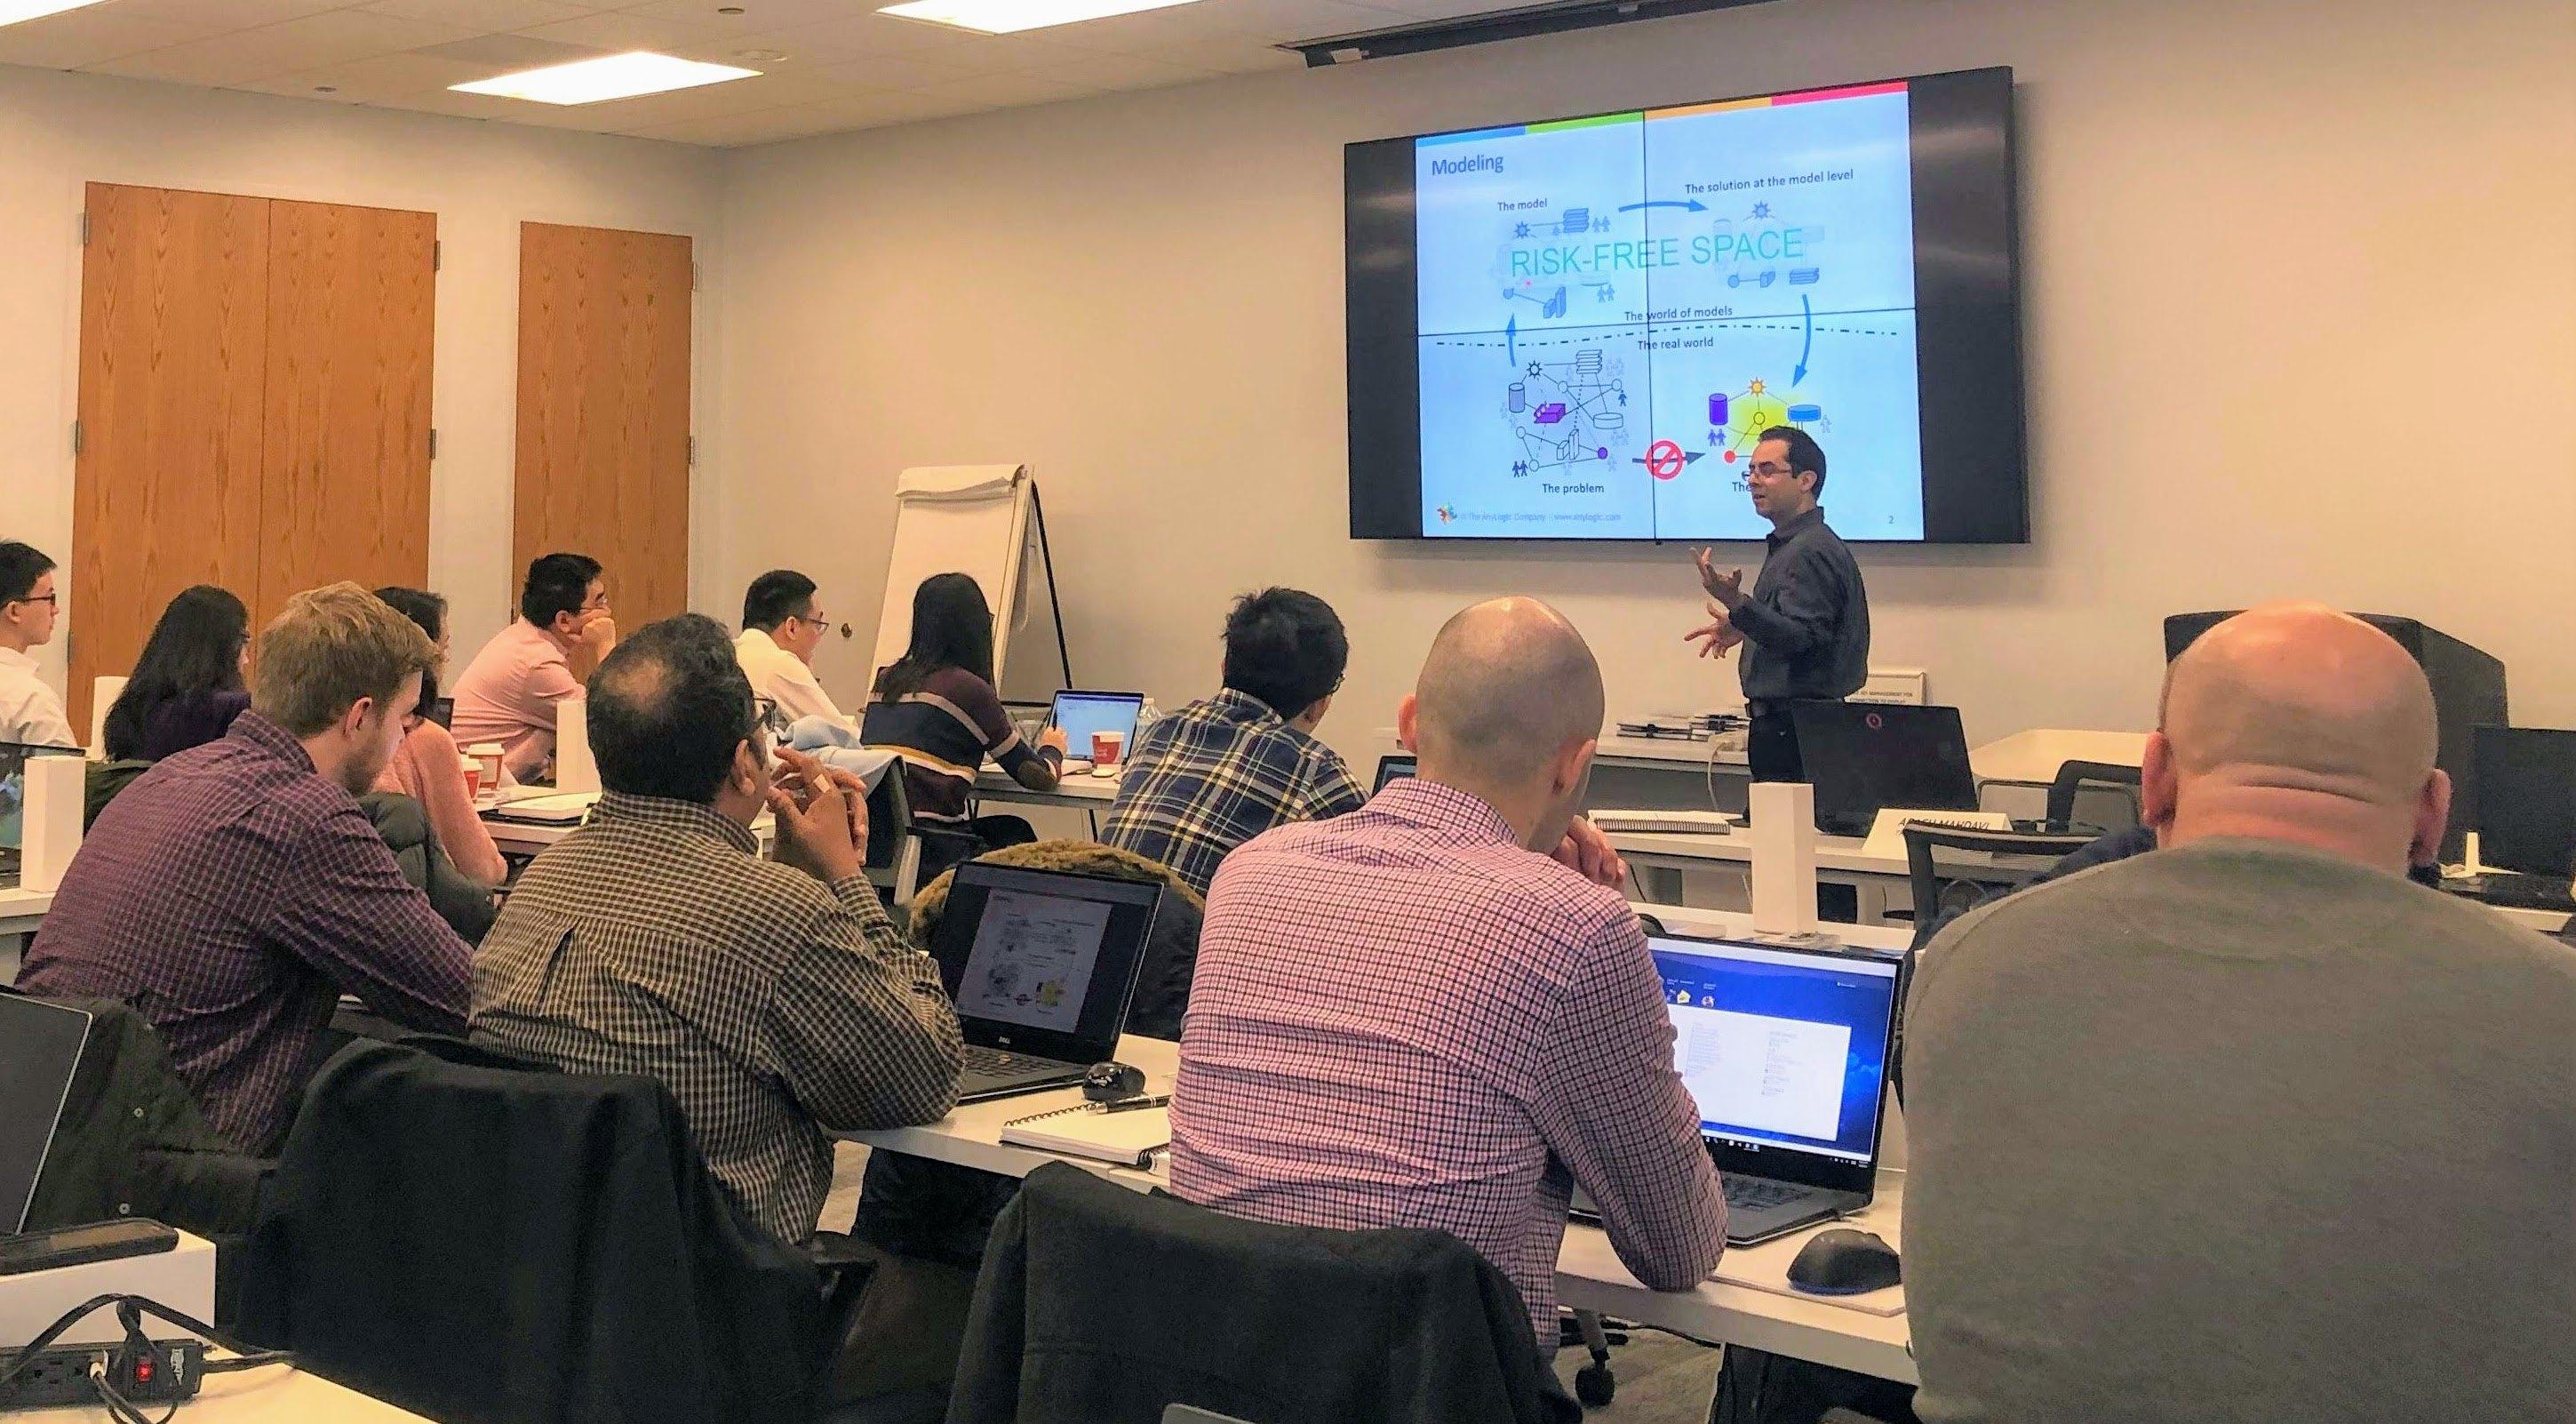 AnyLogic software training in Oakbrook Terrace – AnyLogic